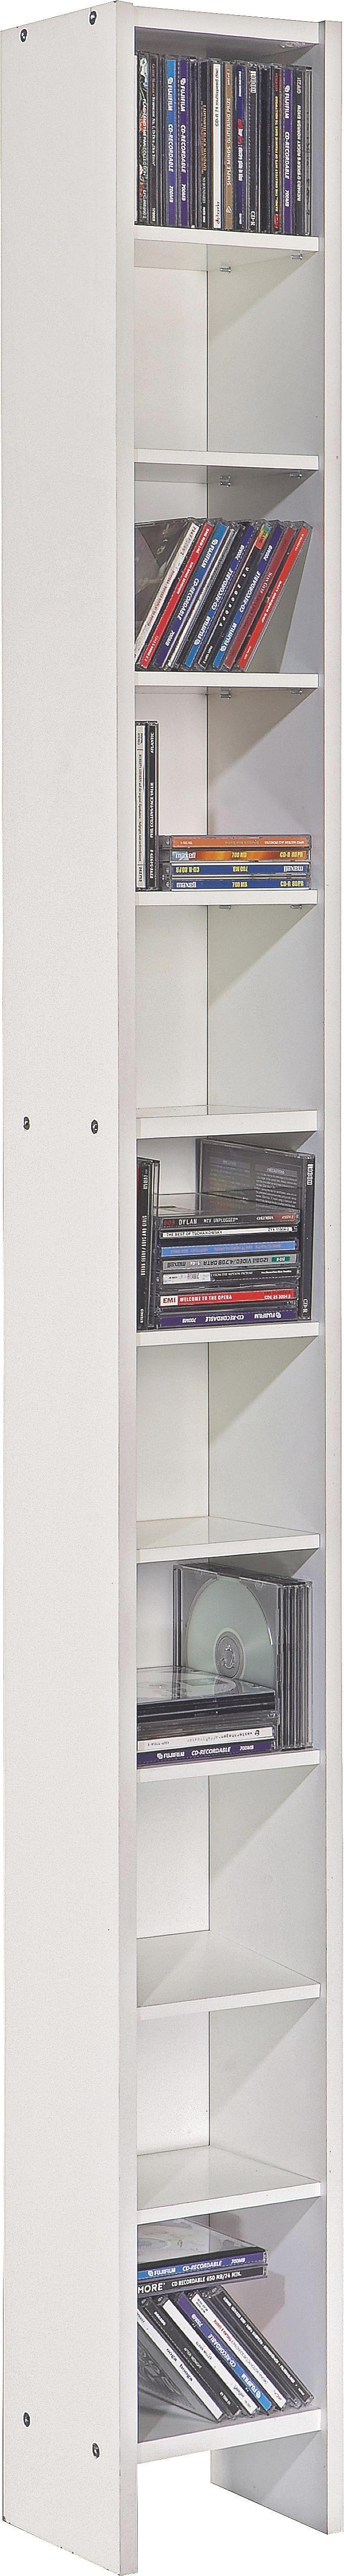 CD-Regal in Weiß - Weiß, Holz (20/185/17cm) - MÖMAX modern living